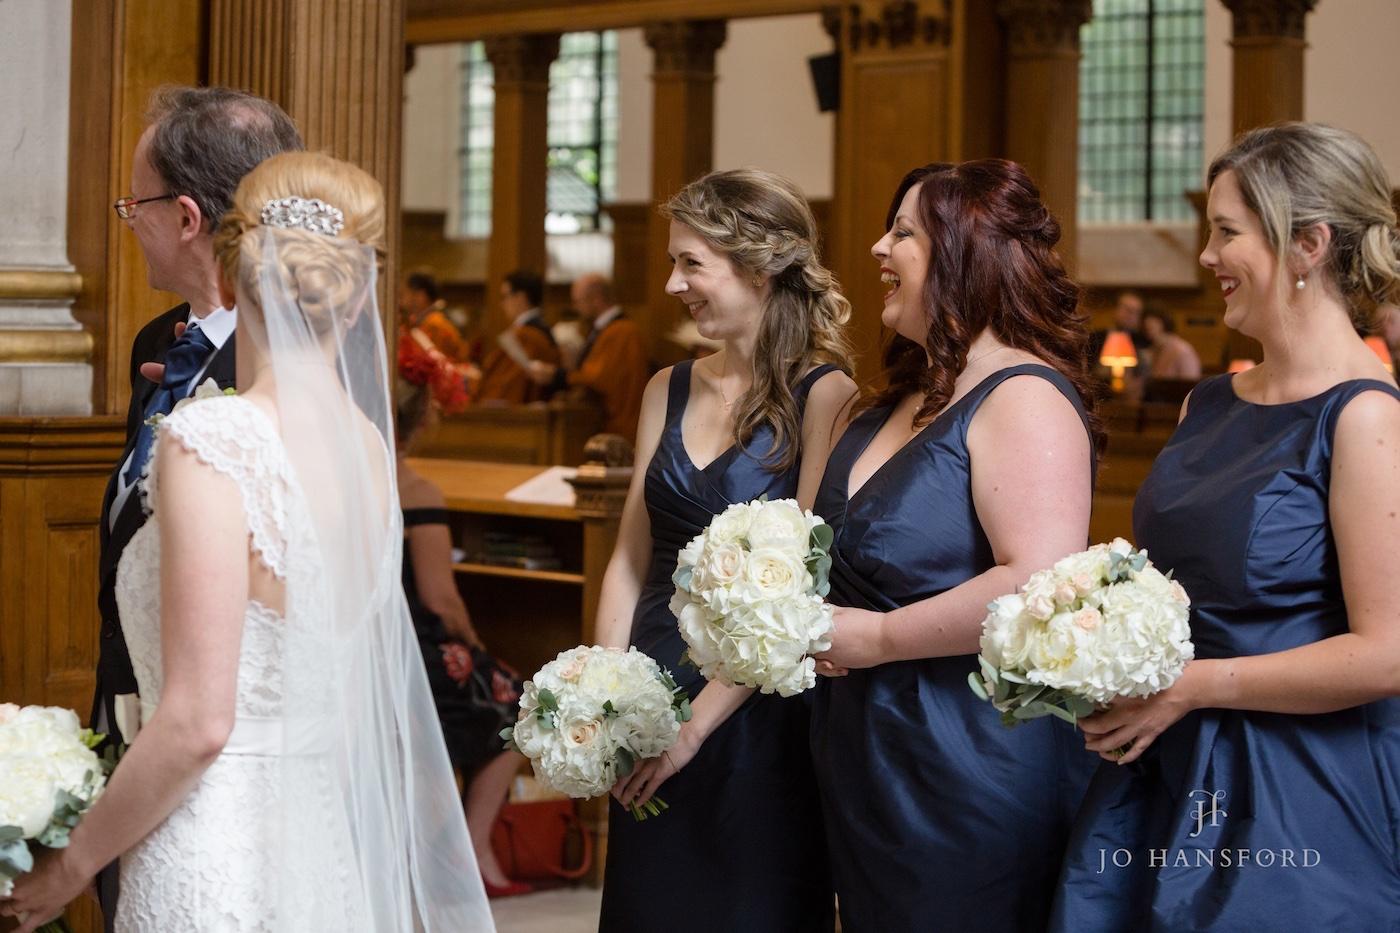 London wedding photographer Jo Hansford